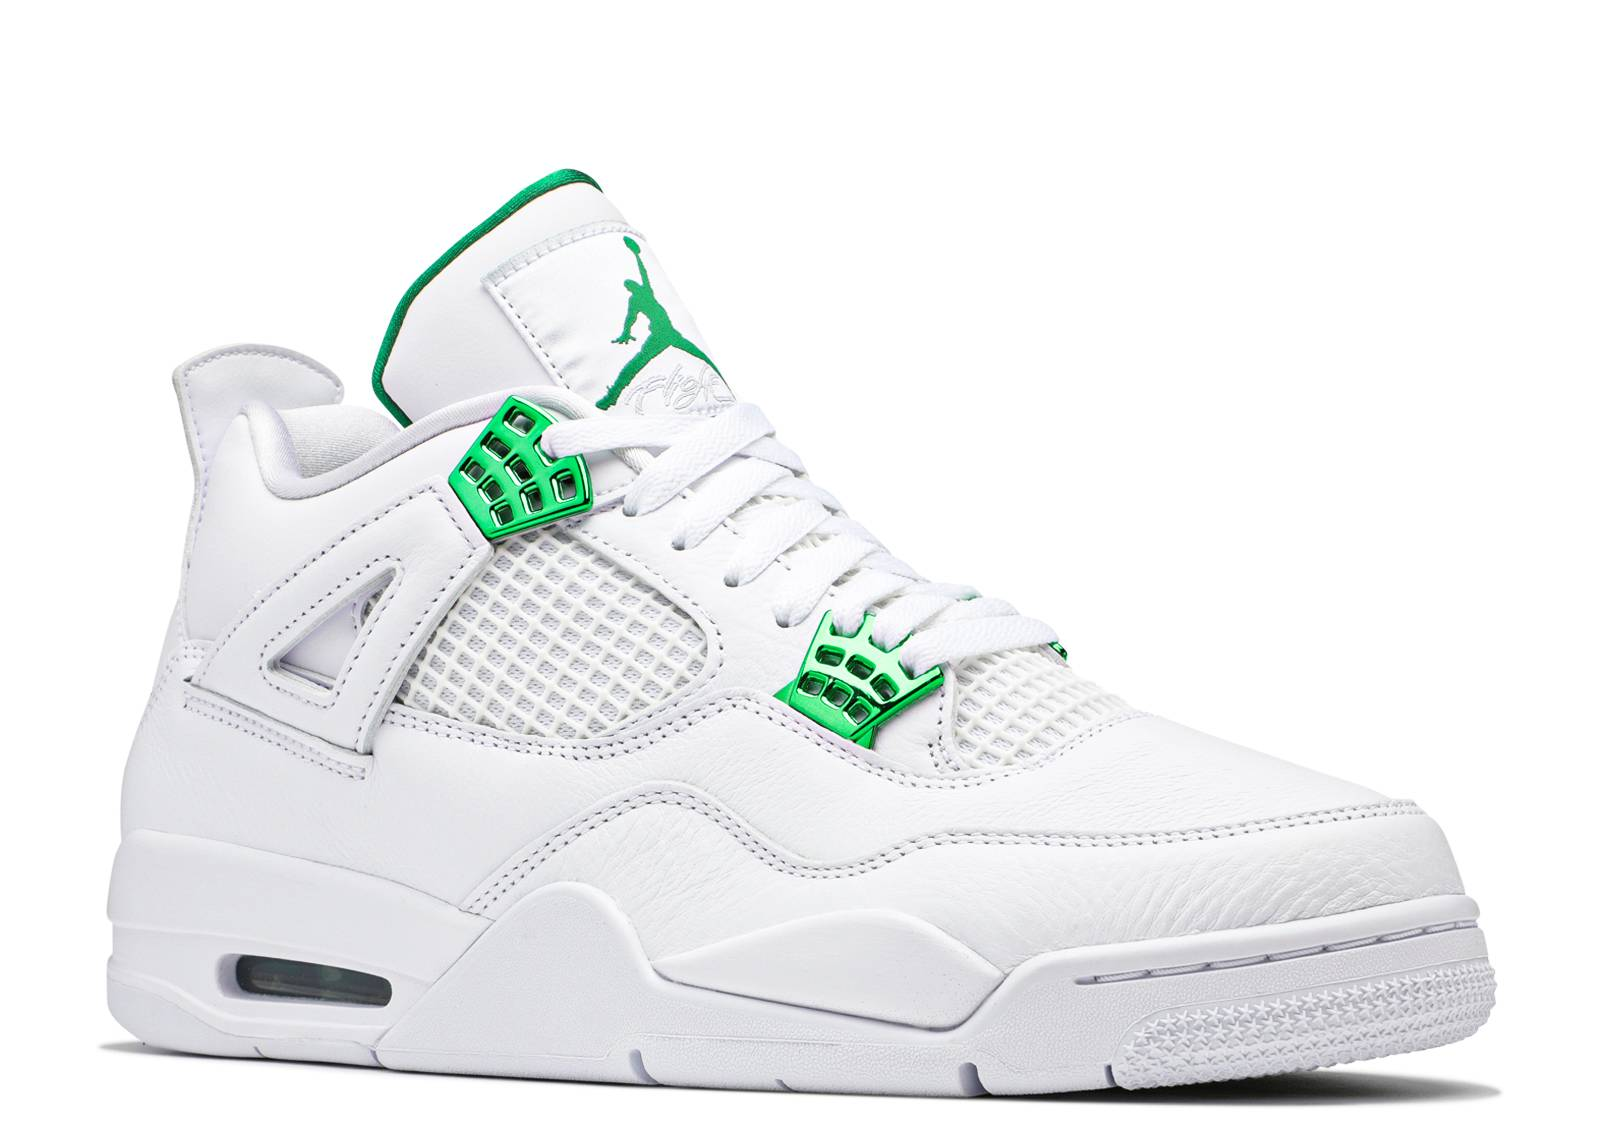 Air Jordan 4 Retro 'Green Metallic'